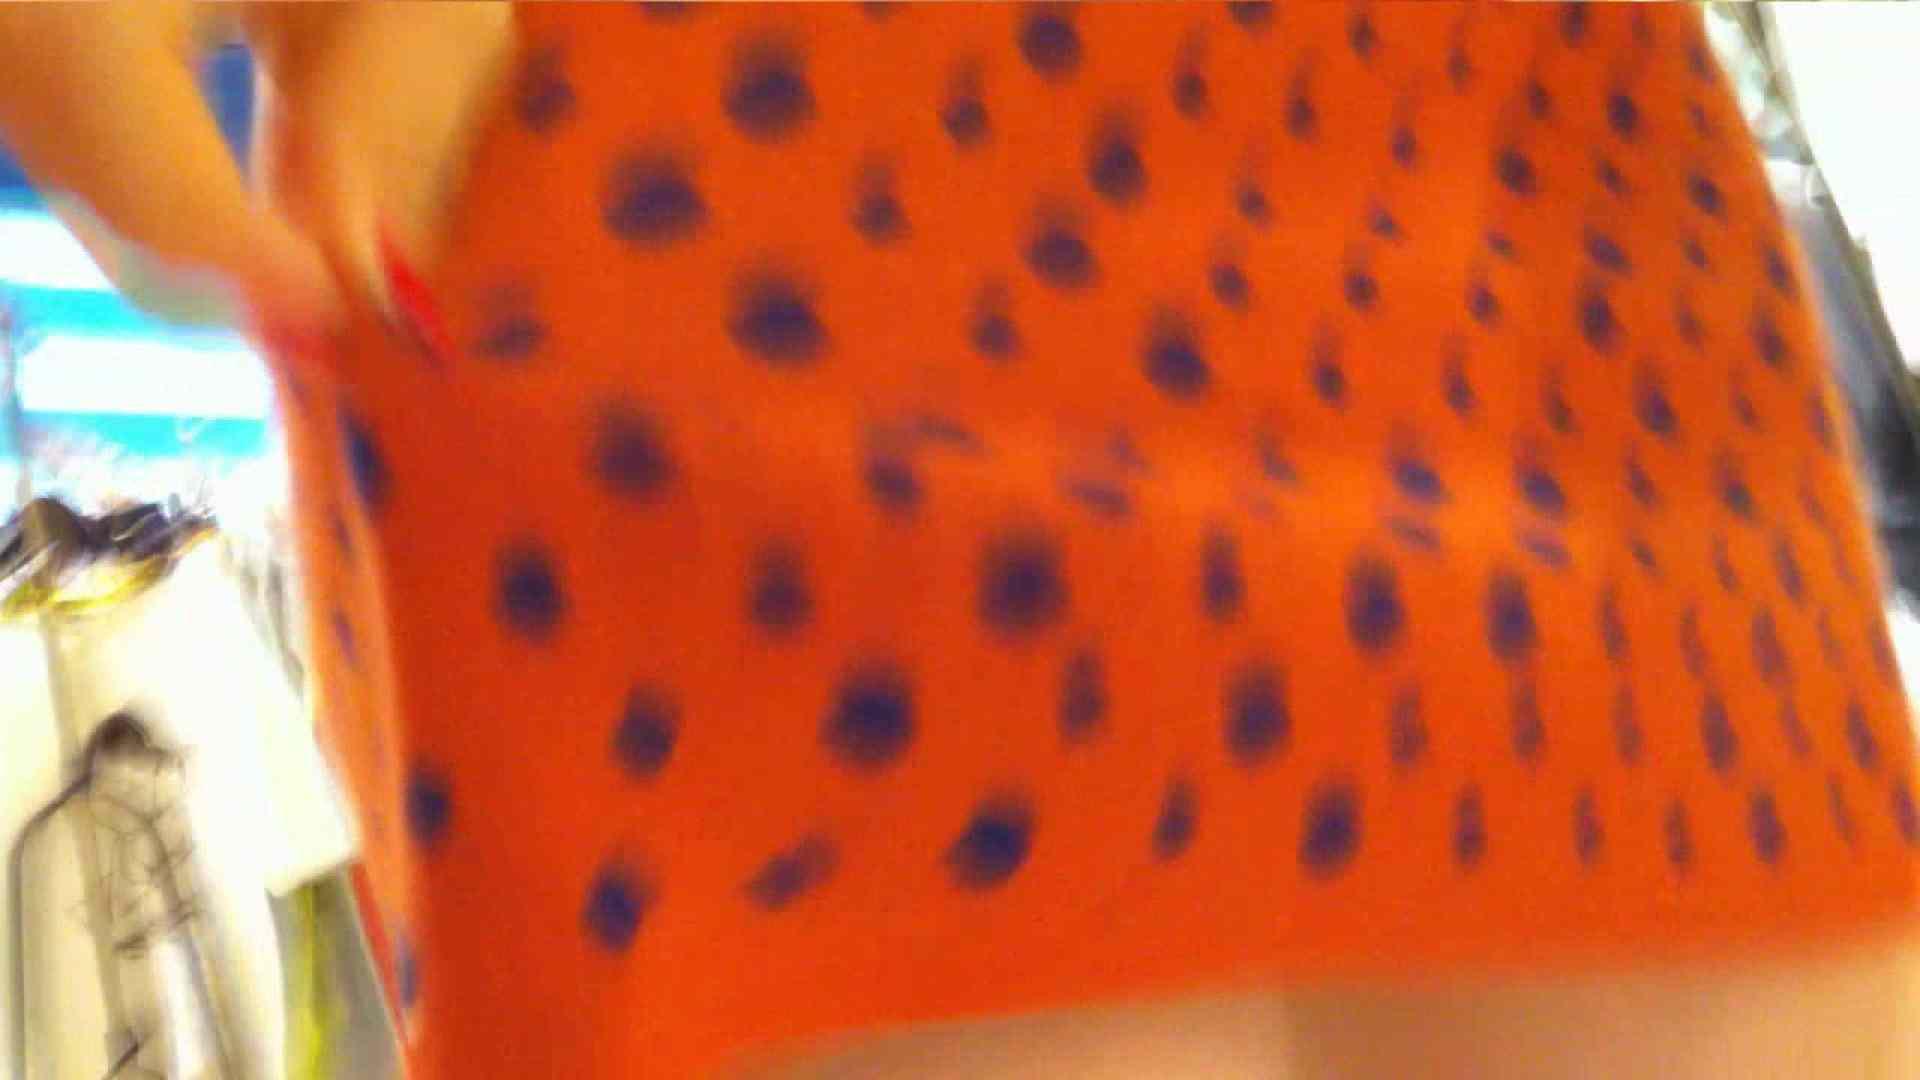 vol.36 美人アパレル胸チラ&パンチラ ポニテ(゚∀゚)キタコレ!! 接写 AV動画キャプチャ 104画像 5